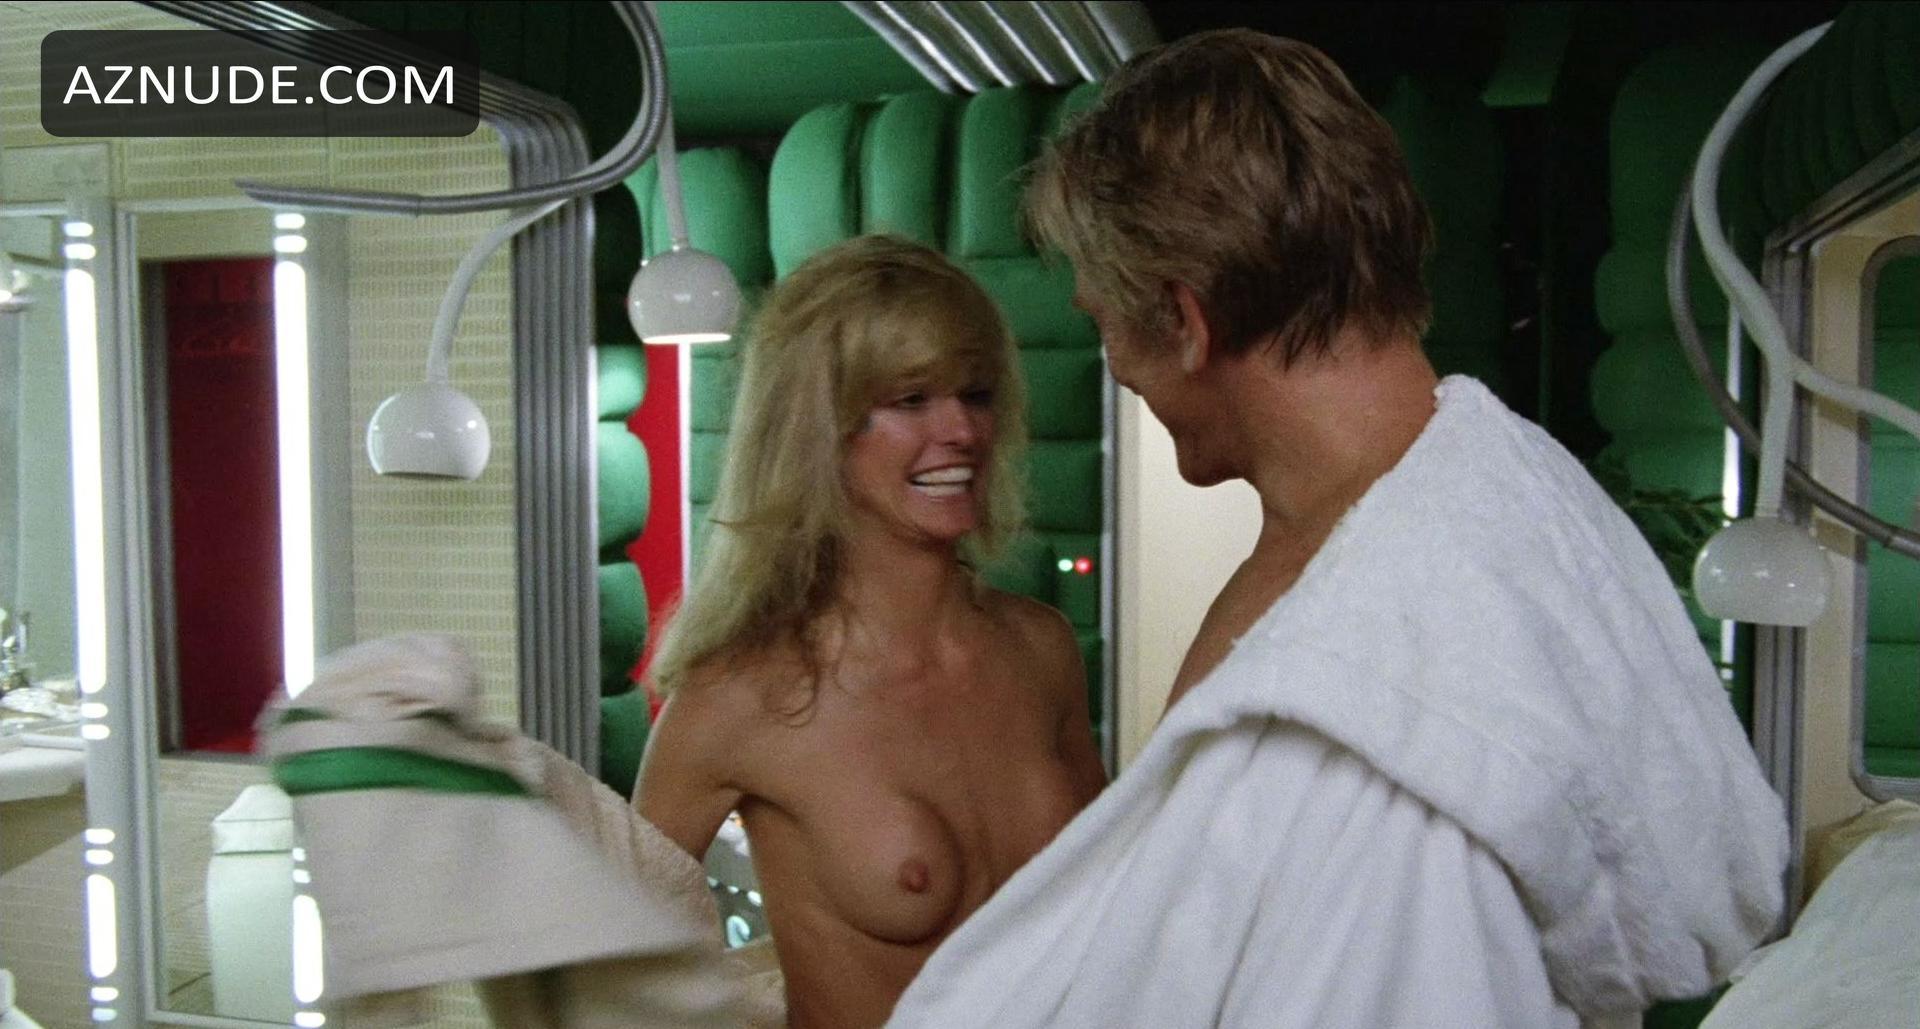 Fawcett nude ladd farrah cheryl